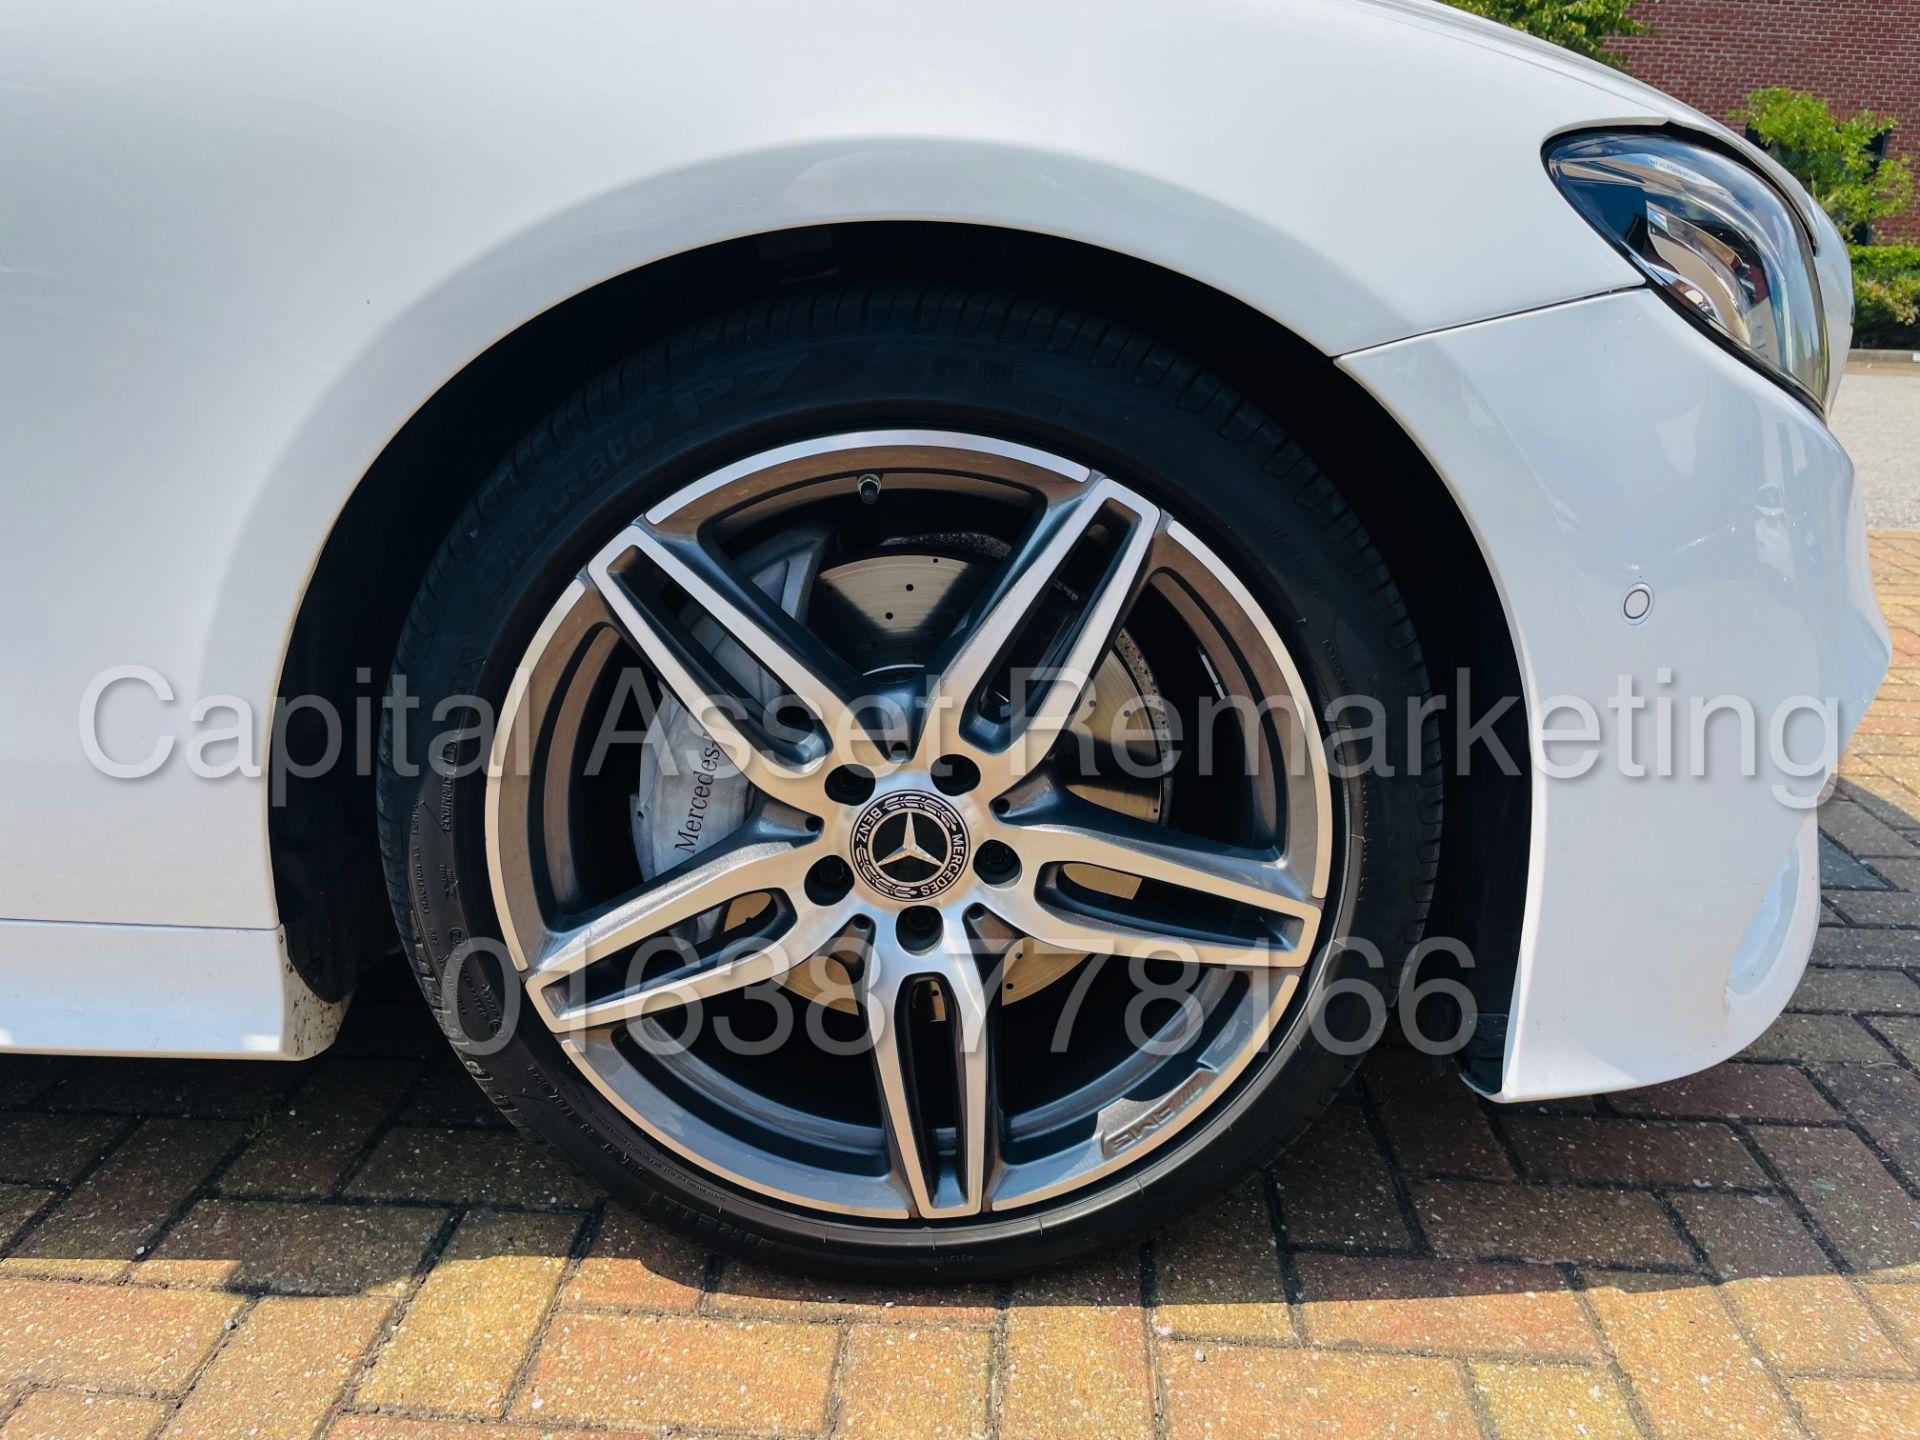 MERCEDES-BENZ E220d *AMG LINE PREMIUM - CABRIOLET* (2018 - EURO 6) '9G AUTO - LEATHER - SAT NAV' - Image 31 of 63